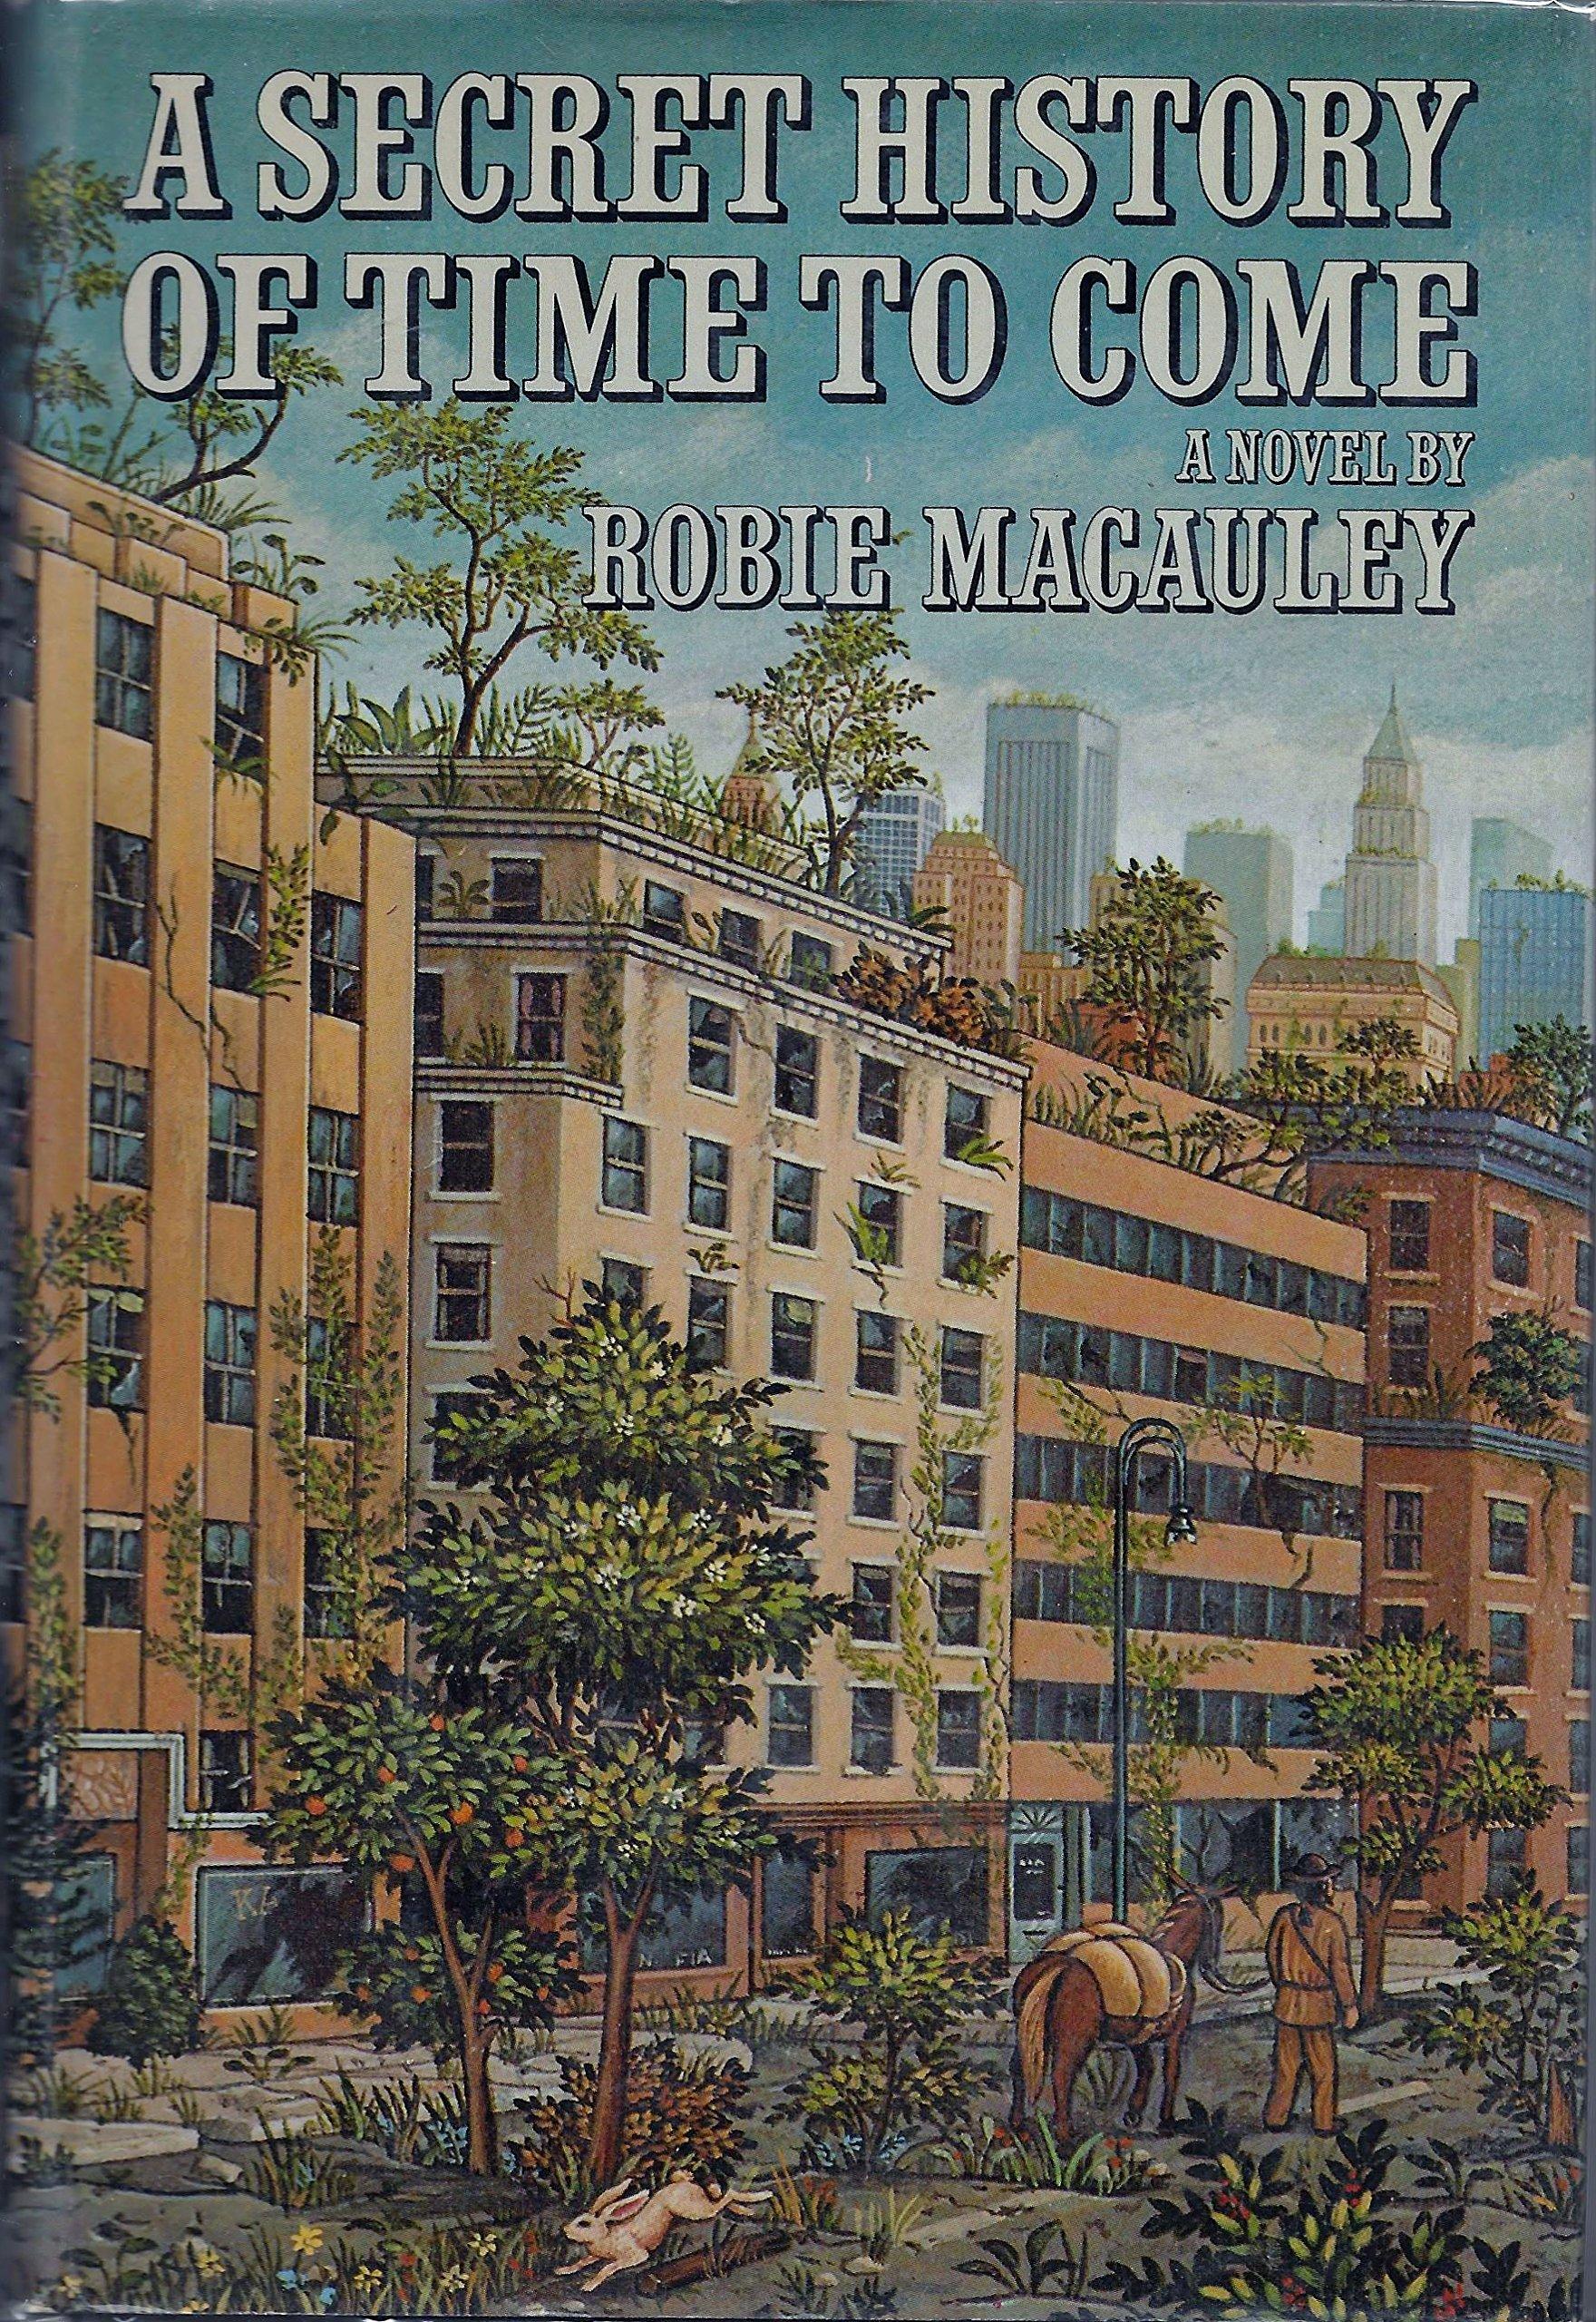 A Secret History of Time to Come: Robie Macauley: 9780394501666 ...